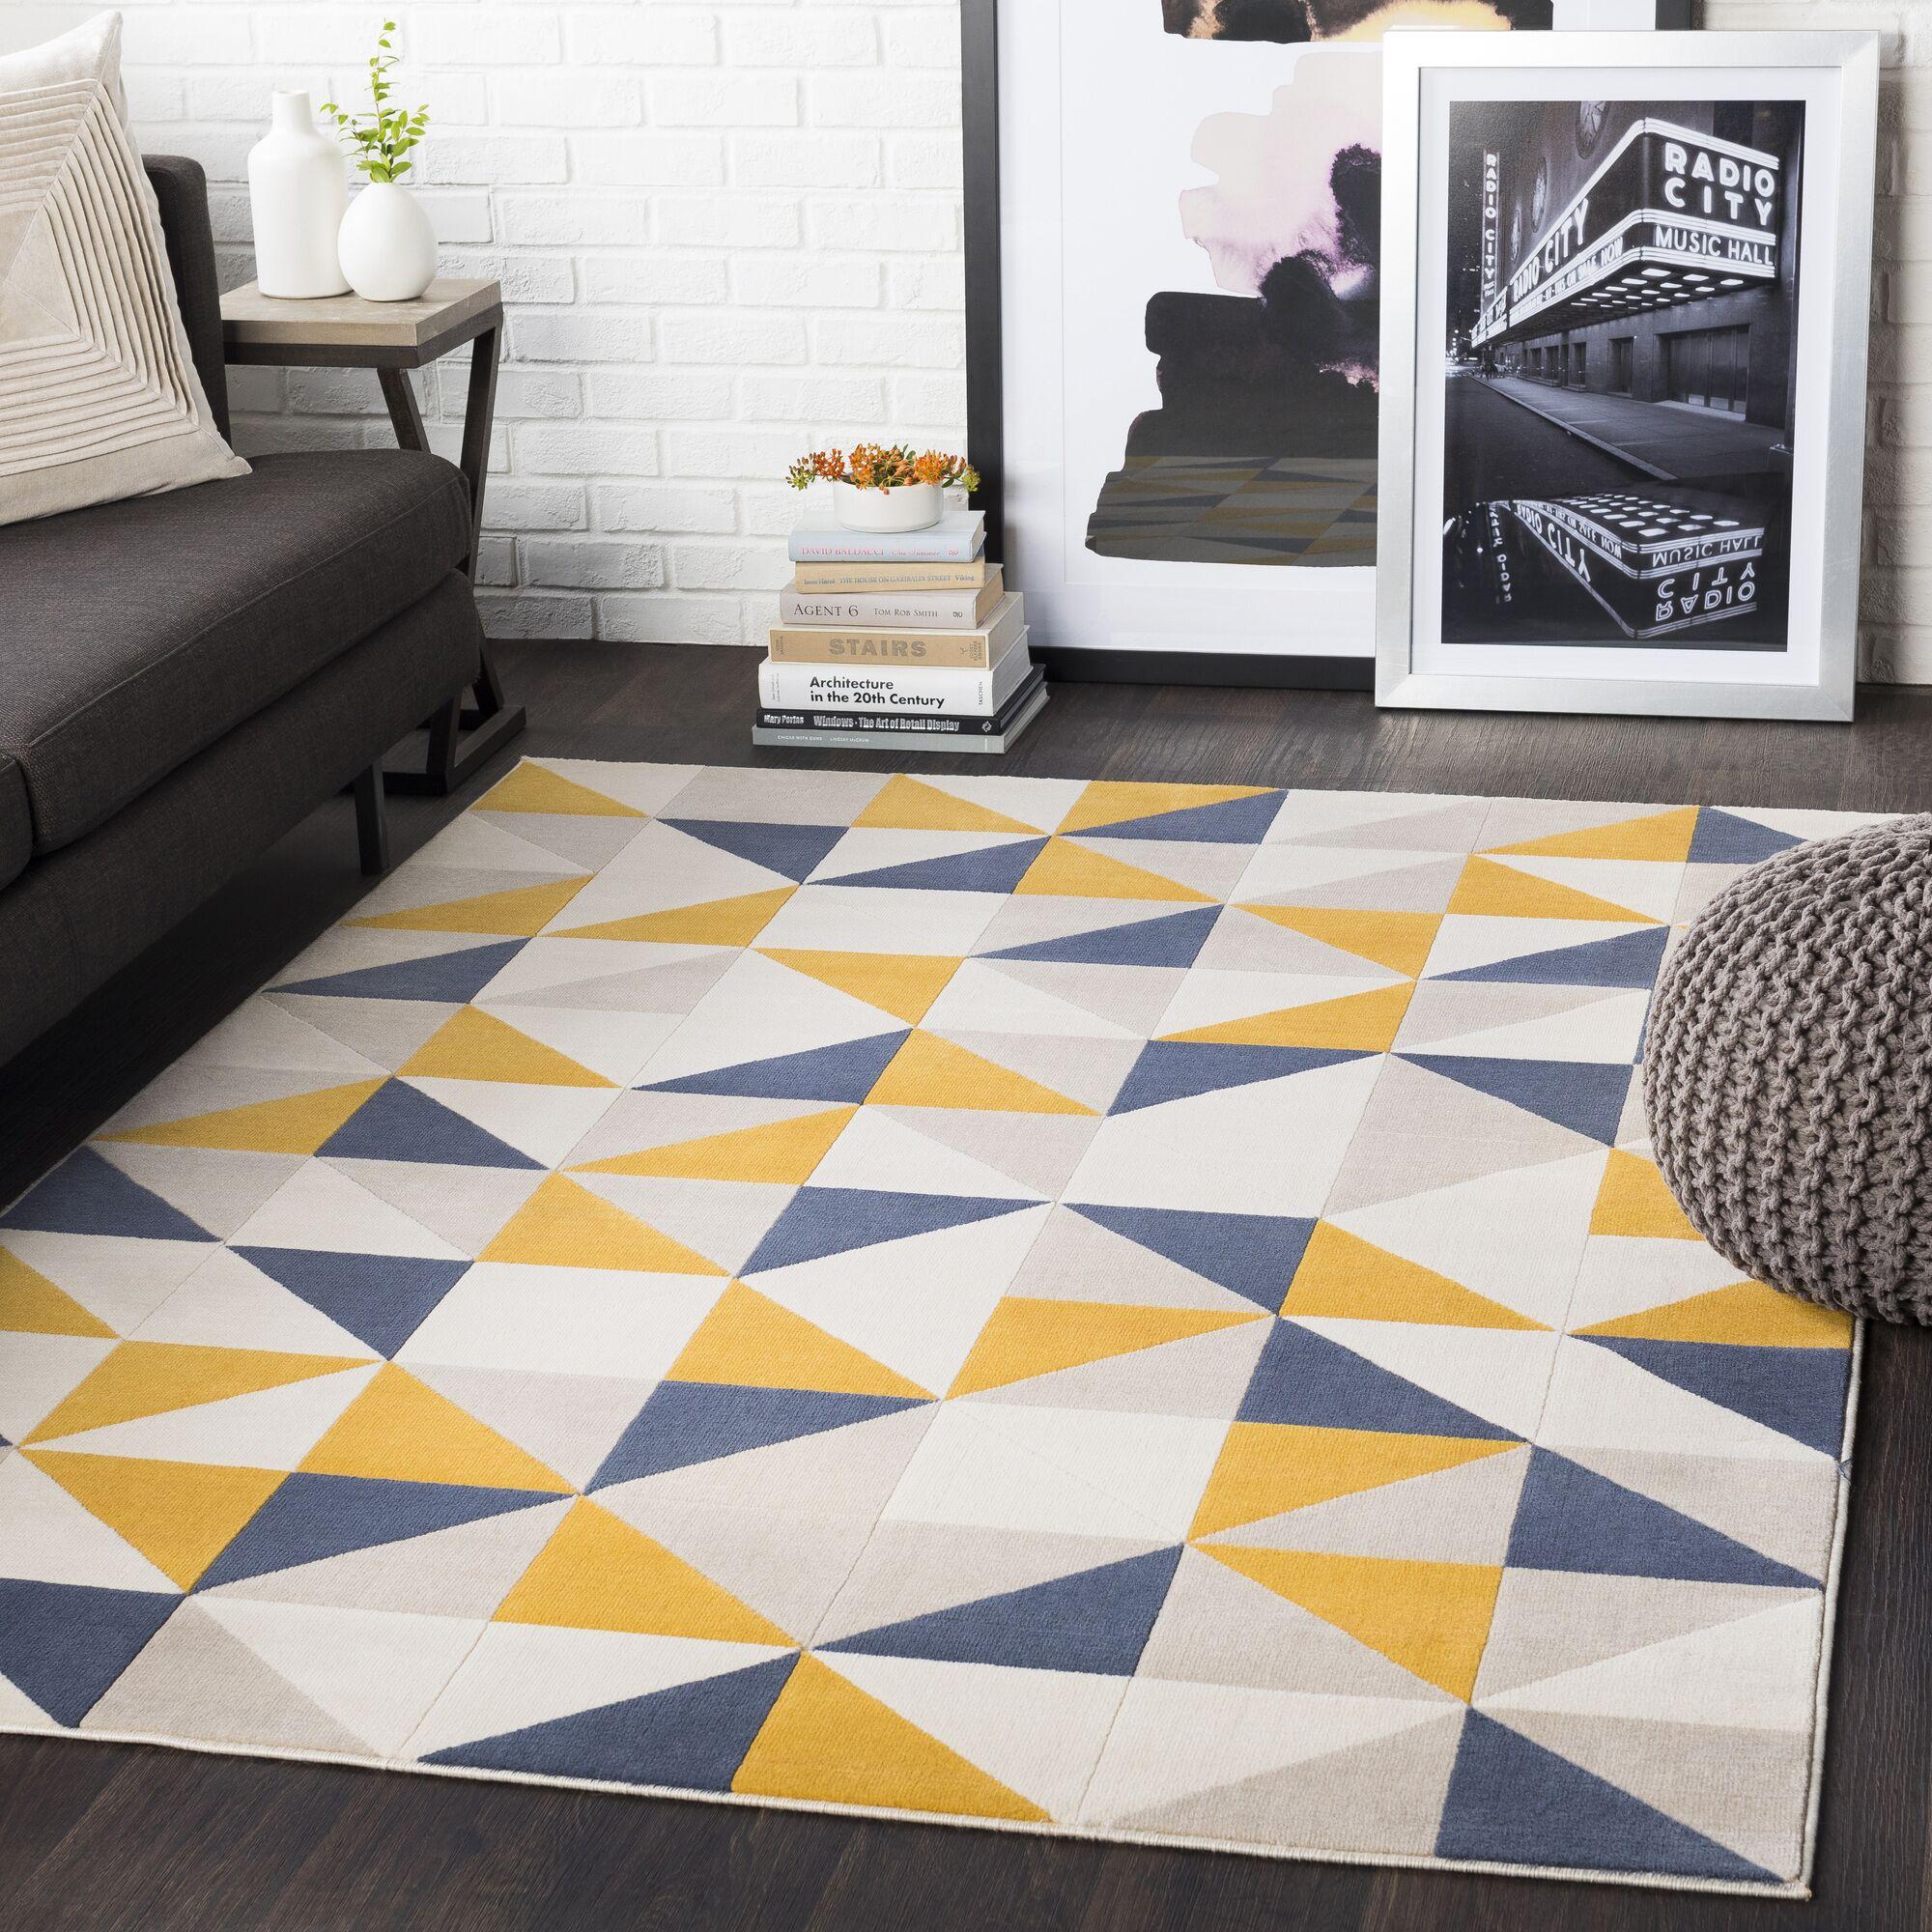 Huerta Geometric Mustard/Charcoal Area Rug Rug Size: Rectangle 5'3